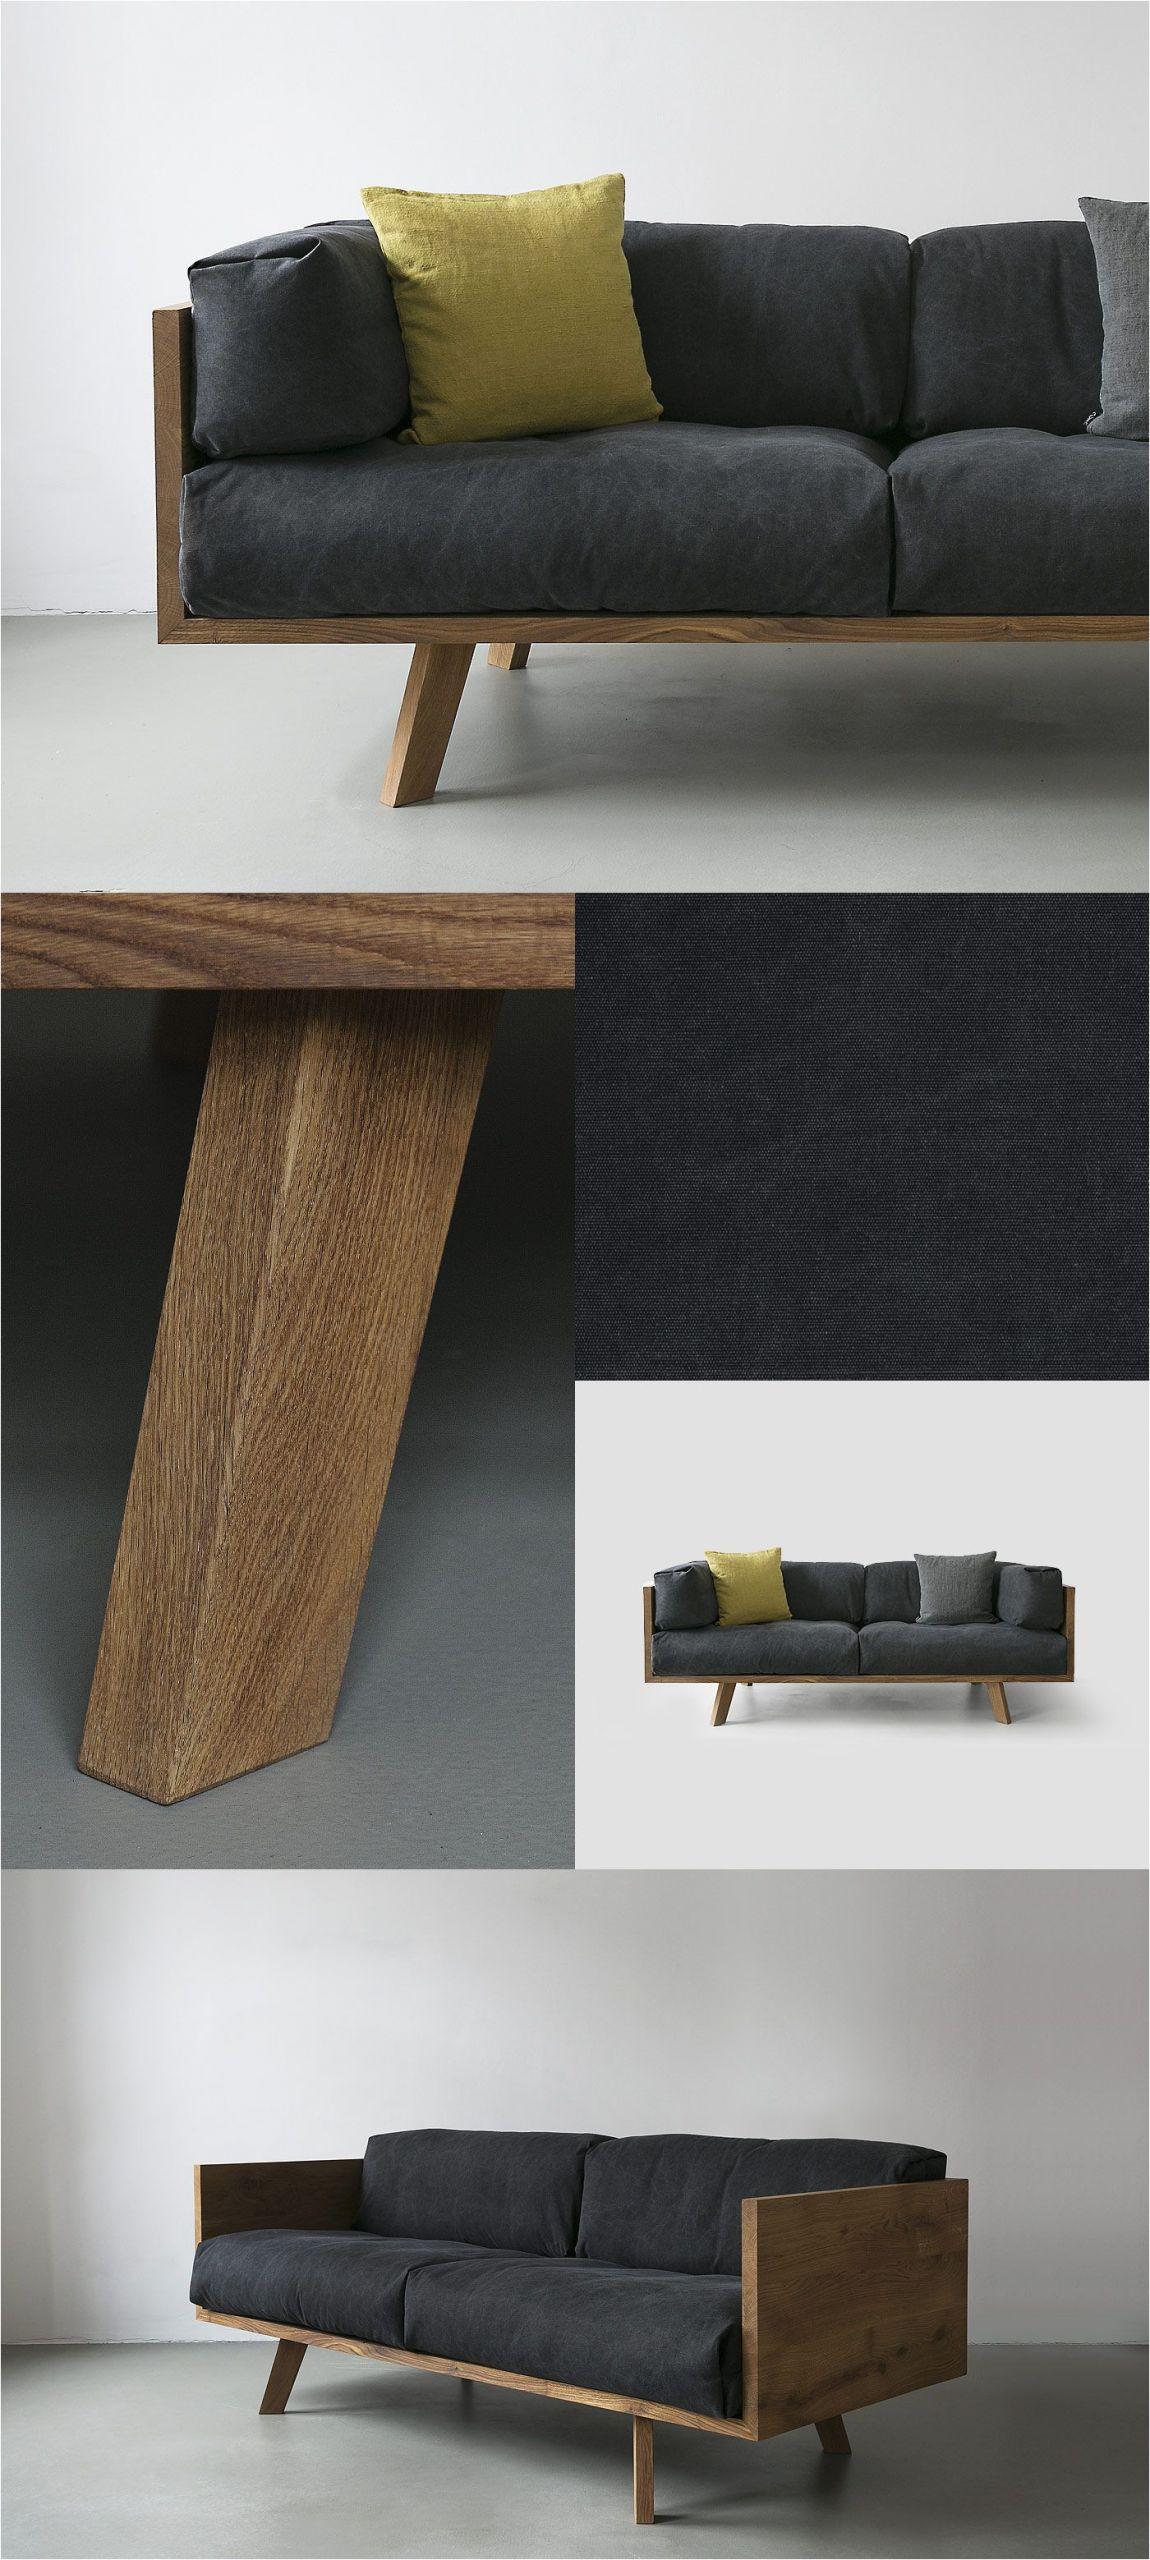 Simple form sofa Diy Furniture I Möbel Selber Bauen I Couch sofa Daybed I